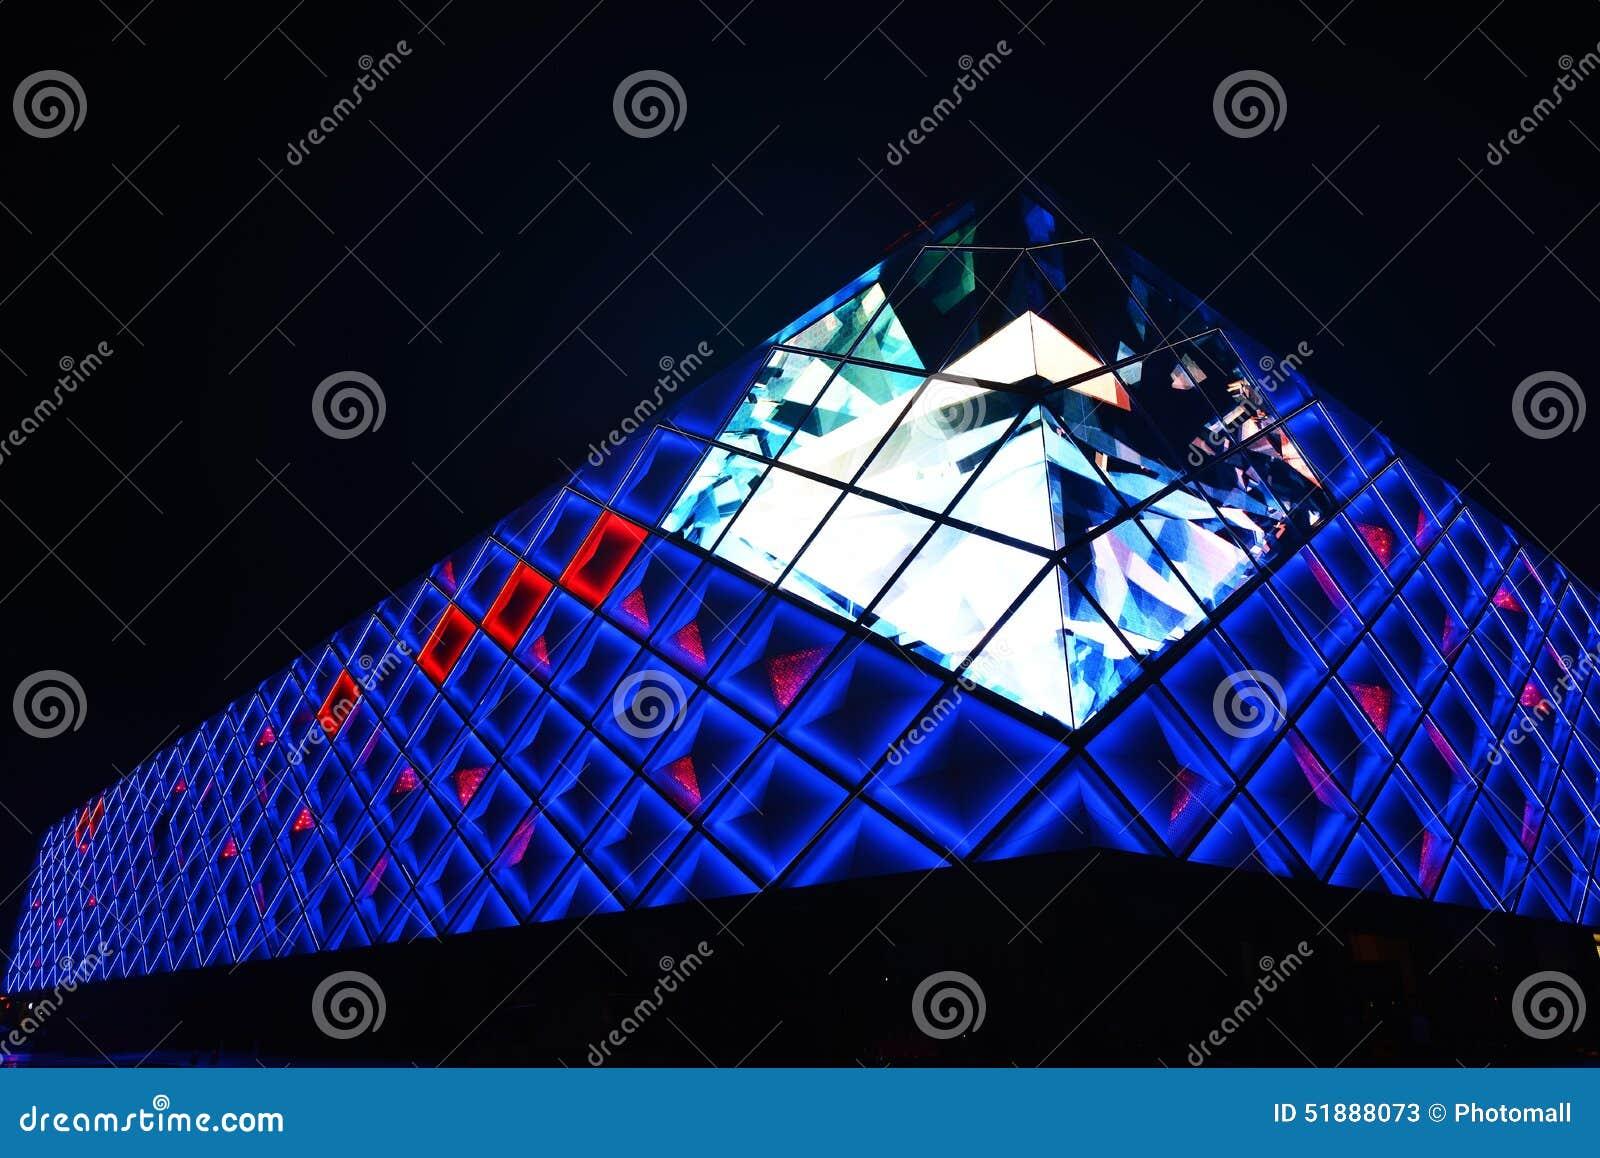 Illuminant led lights exterior wall of modern commercial building illuminant led lights exterior wall of modern commercial building stock image image of center commercial 51888073 mozeypictures Image collections